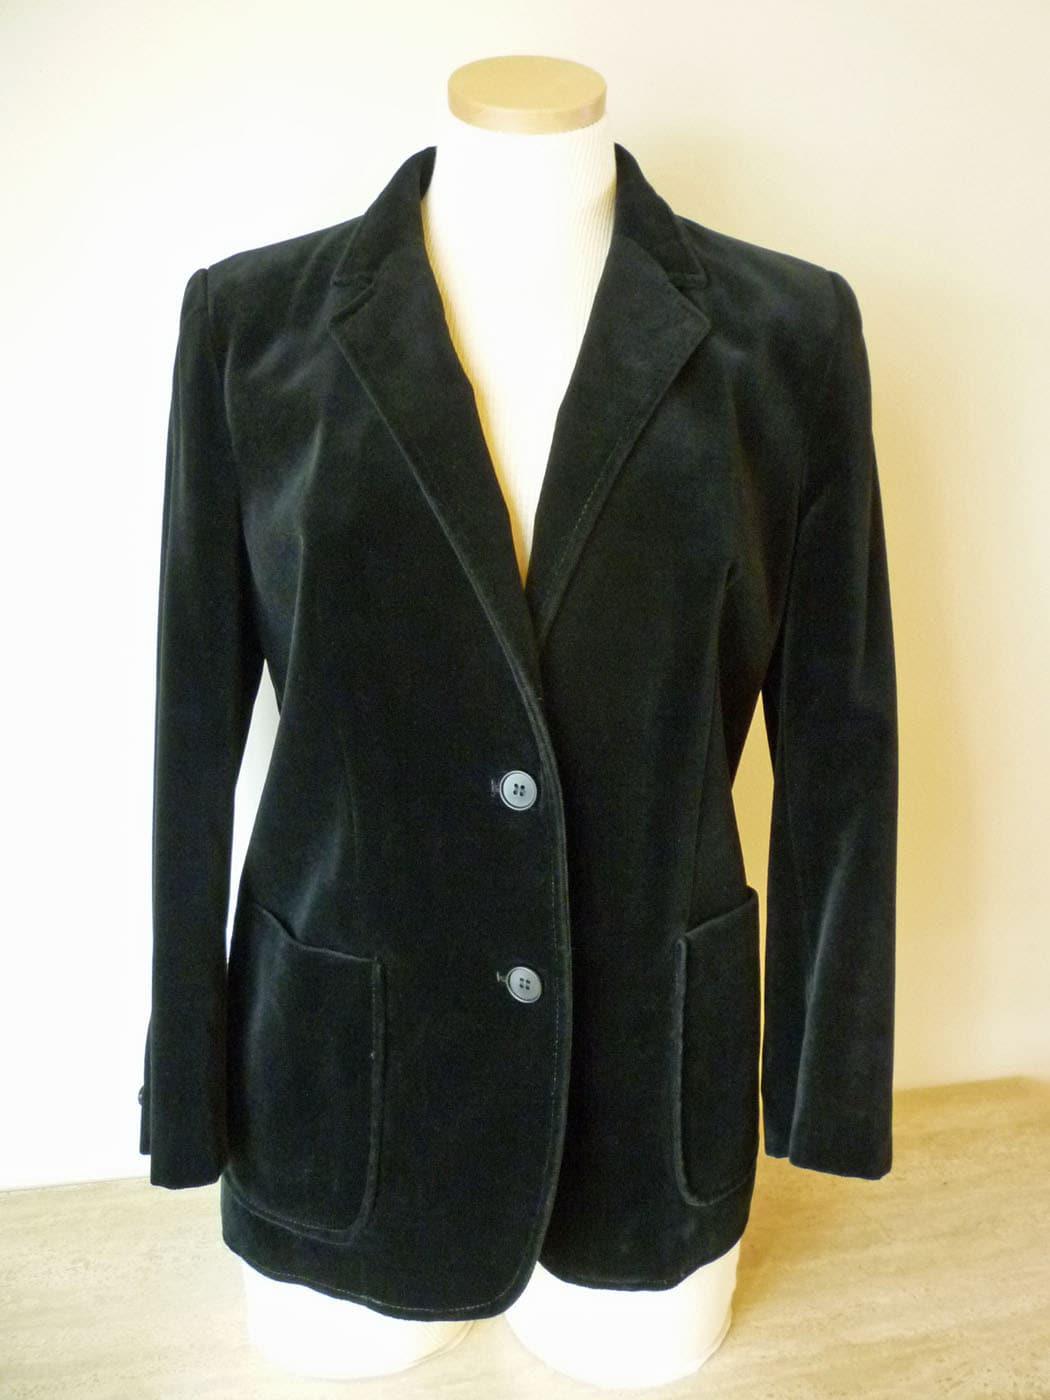 Black Velour Blazer Jacket for Women Made in Belgium Size